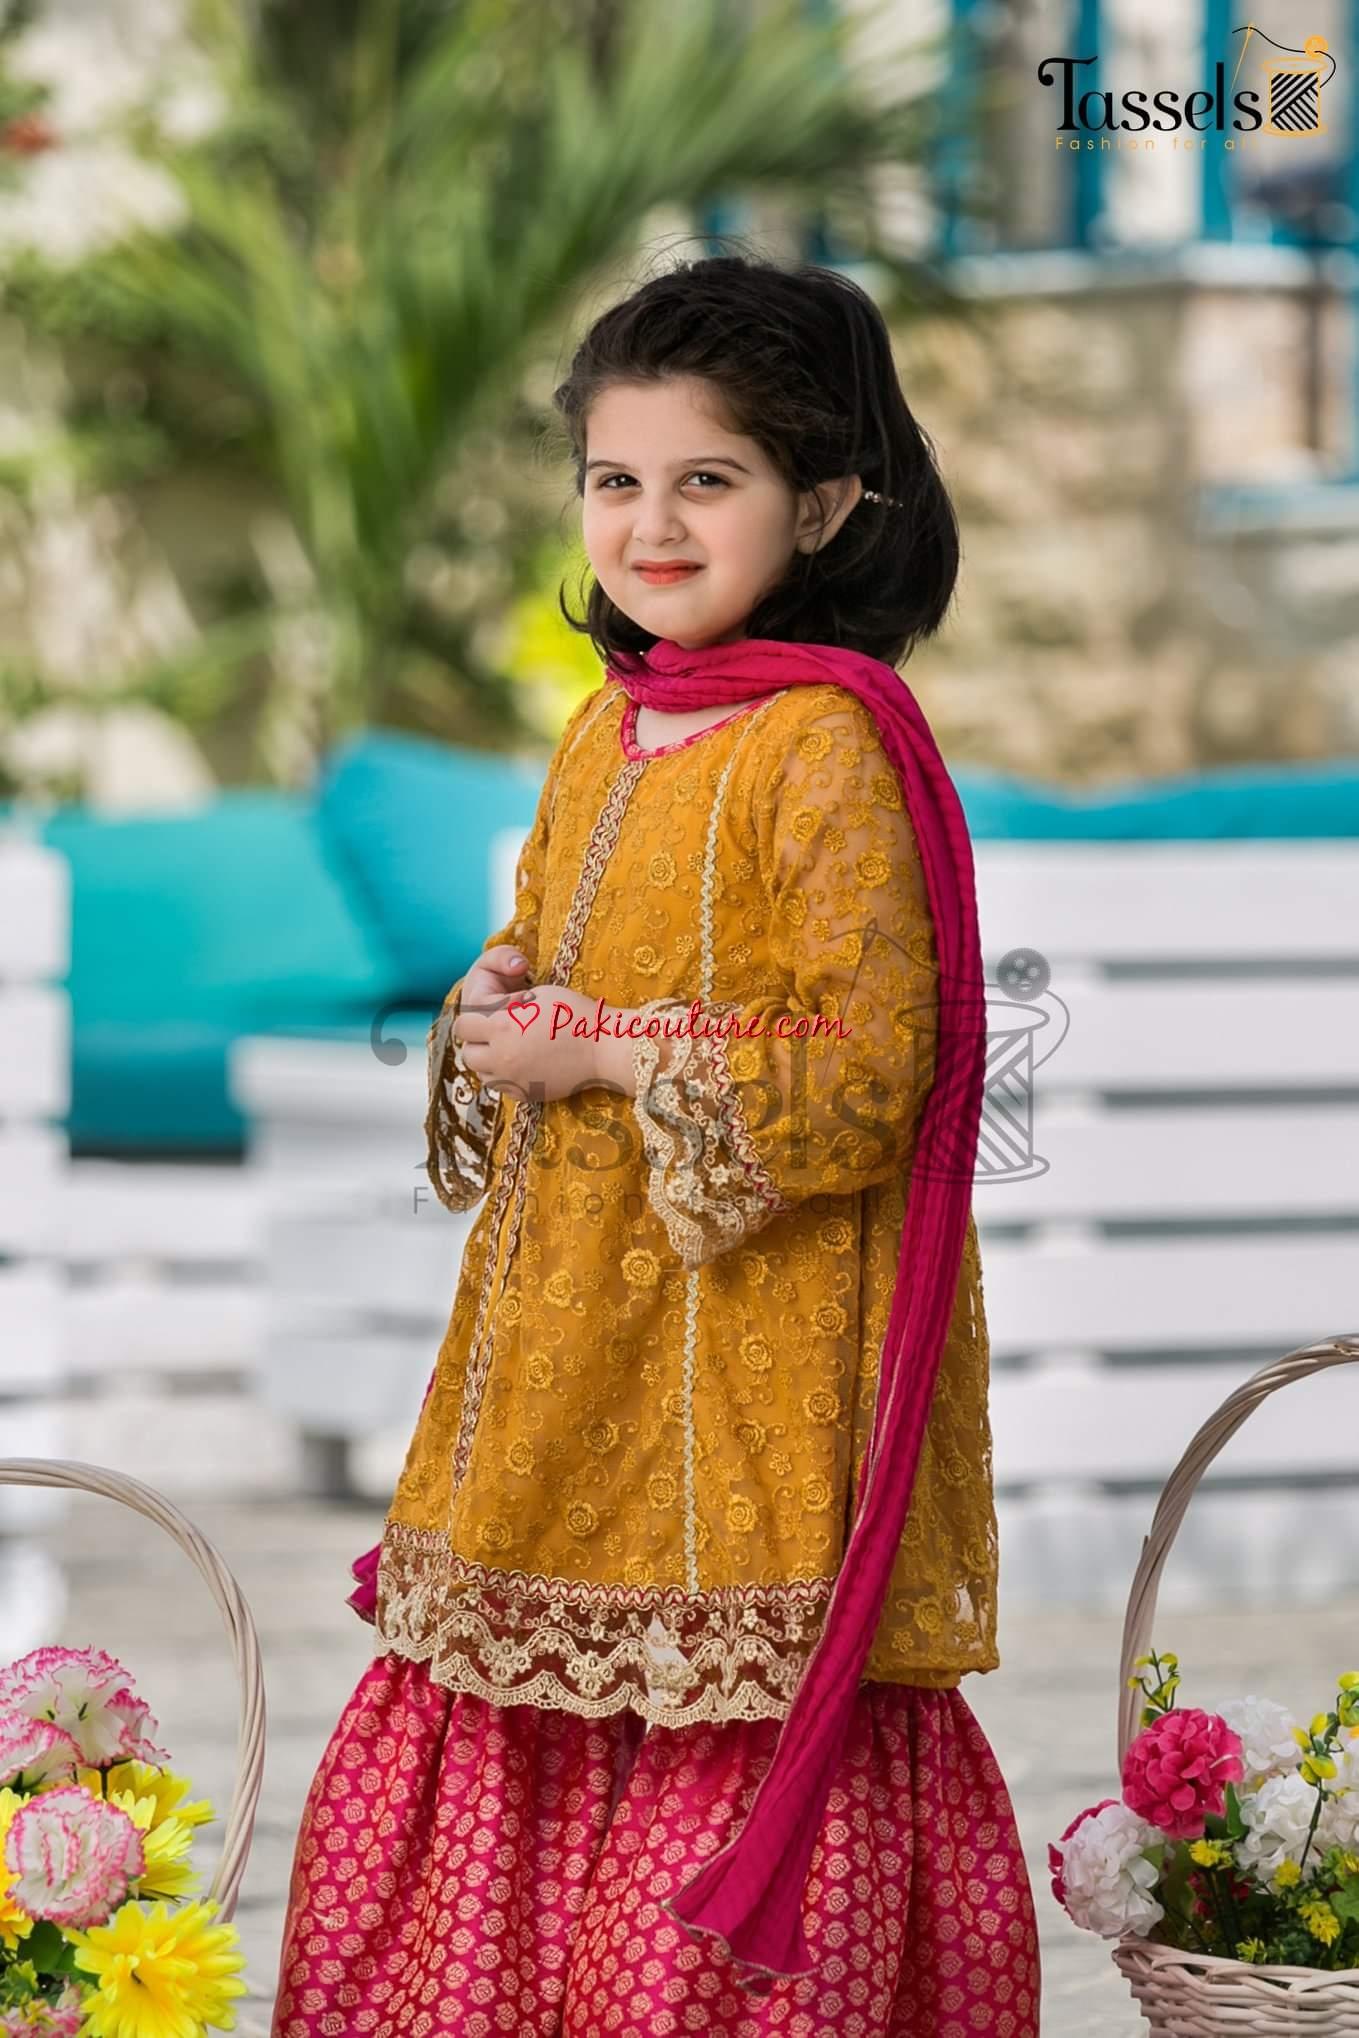 Tassels Kids Rangeen Vol-1 Eid Girls Collection 2019 Shop